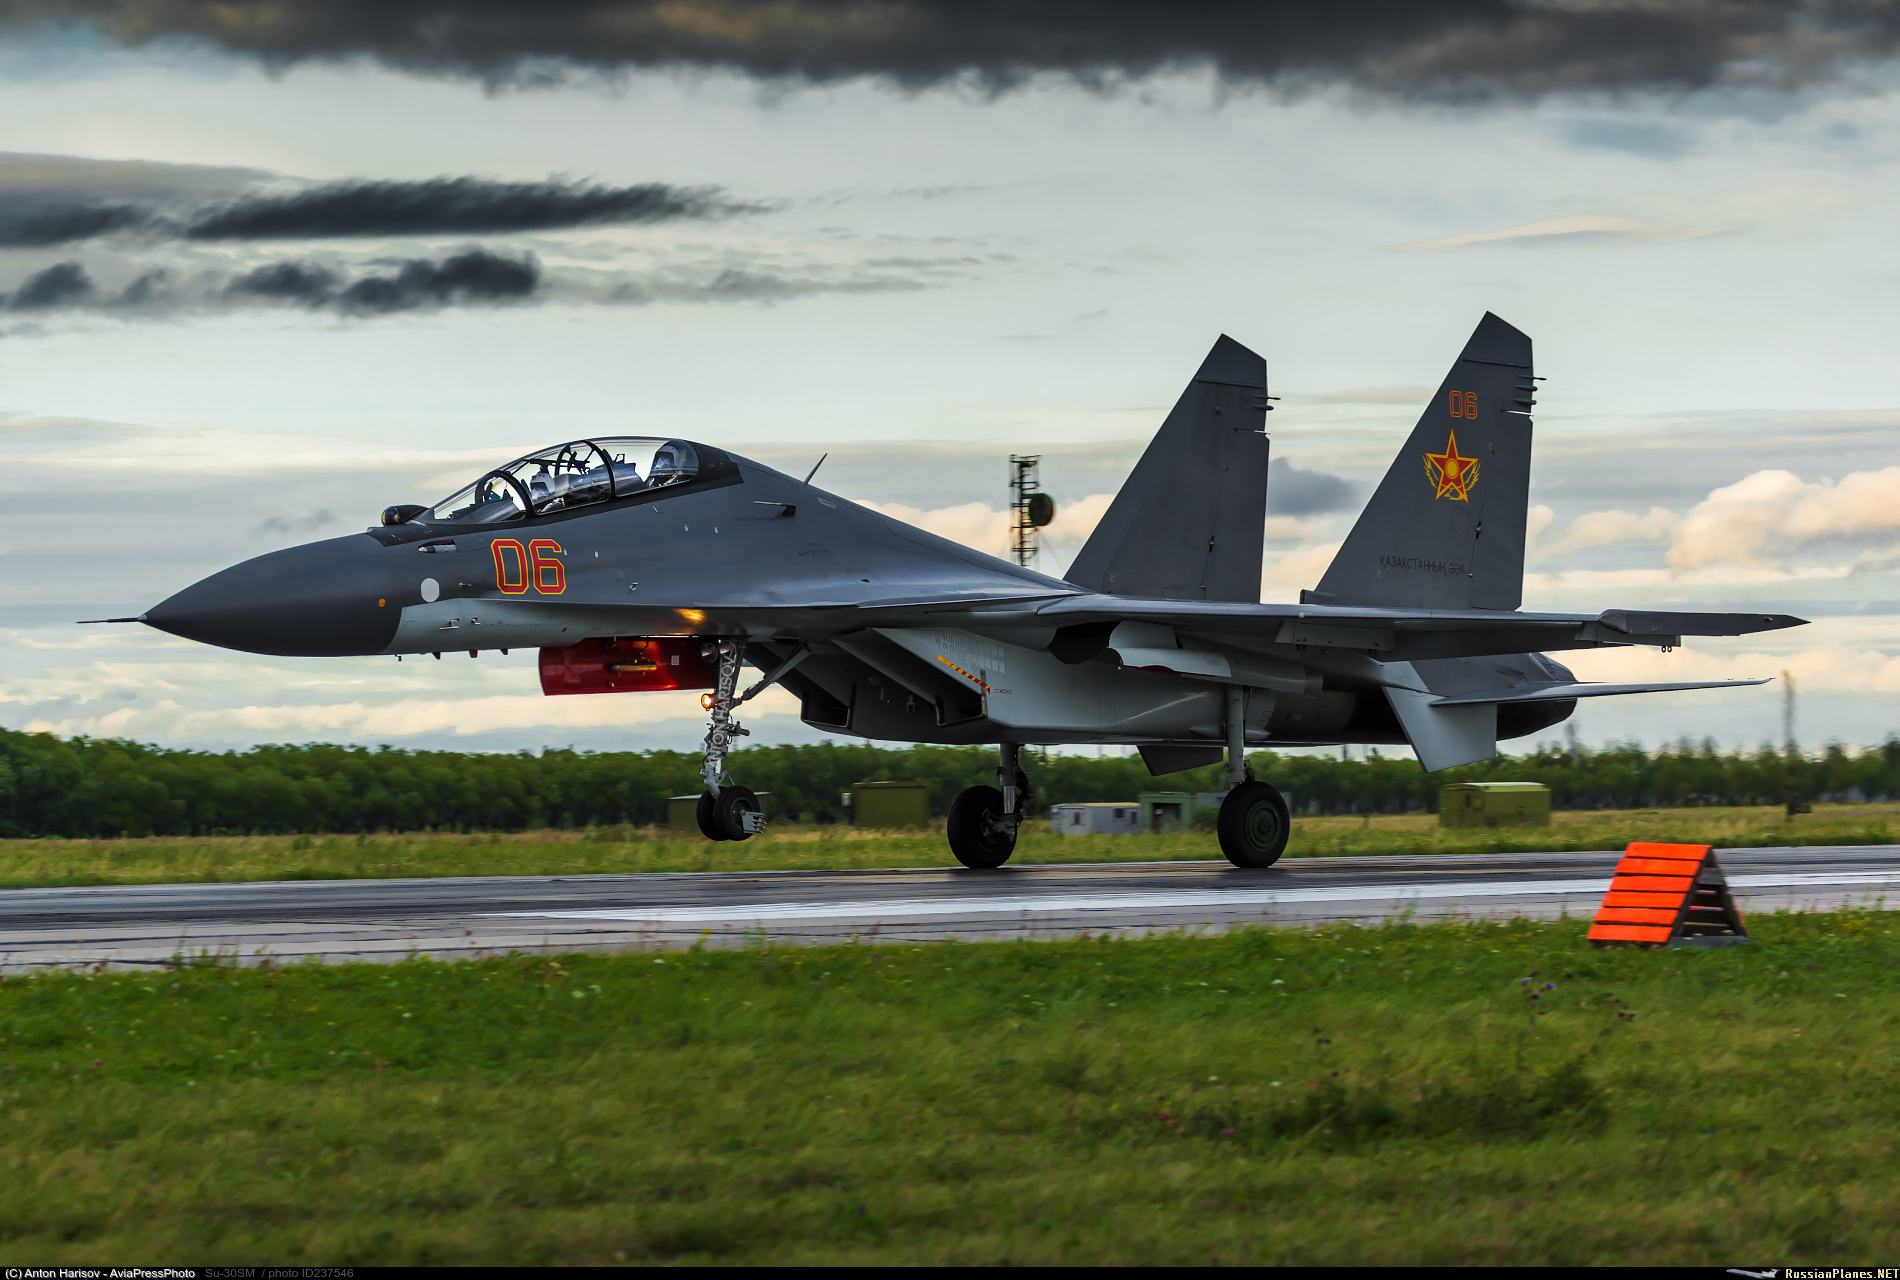 https://russianplanes.net/images/to238000/237546.jpg